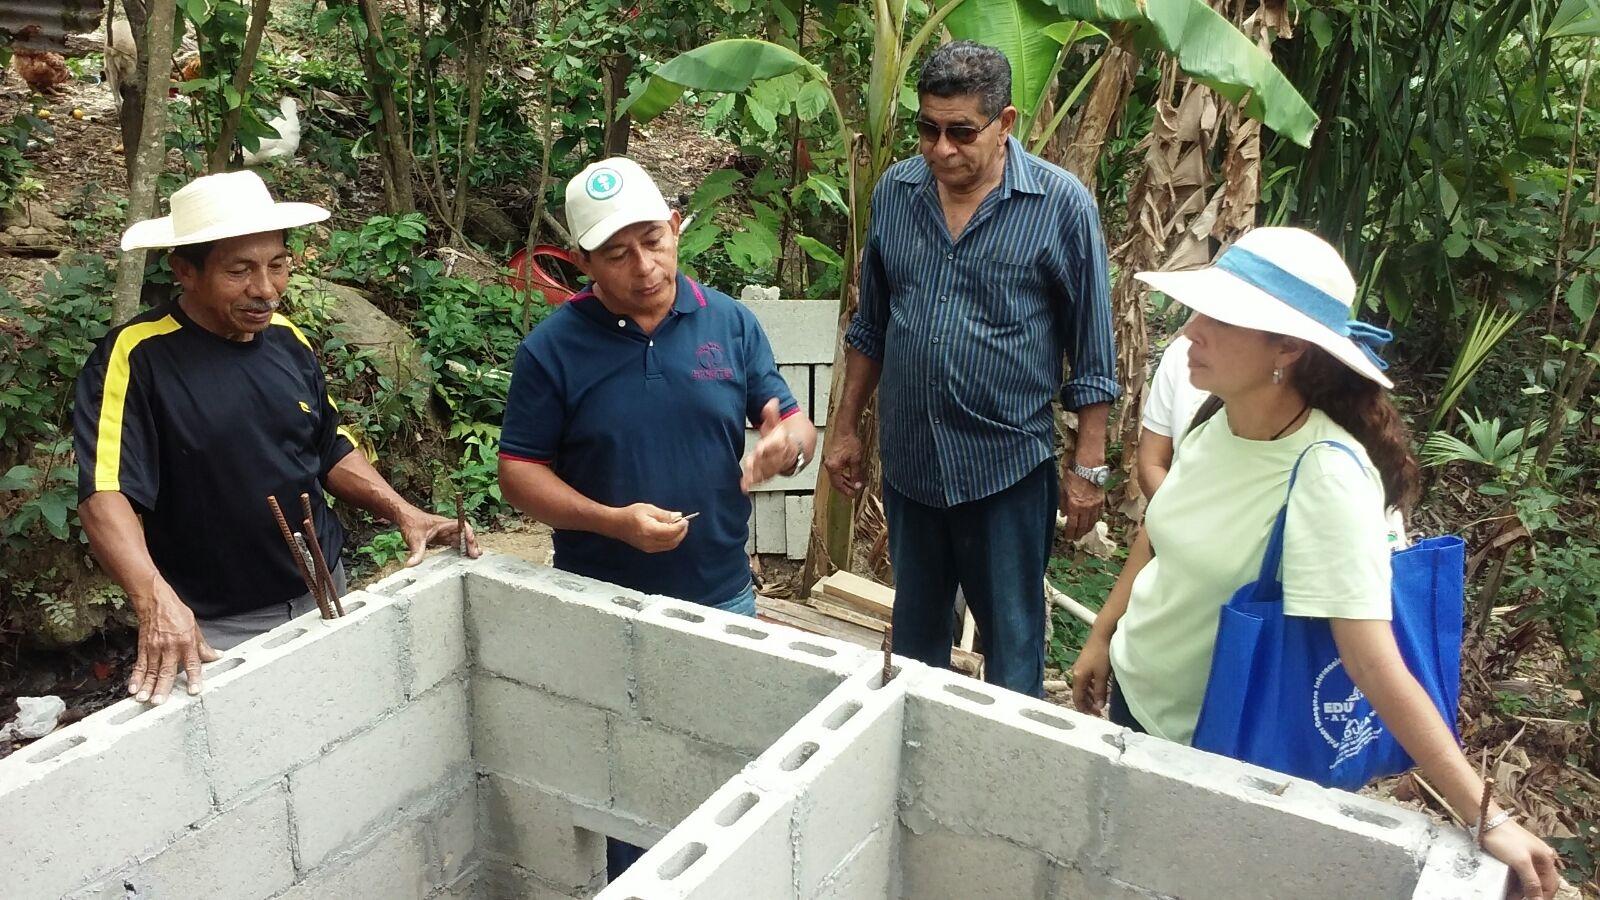 Mariano explains the technology behind composting latrines - photo by Ediberto Trujillo